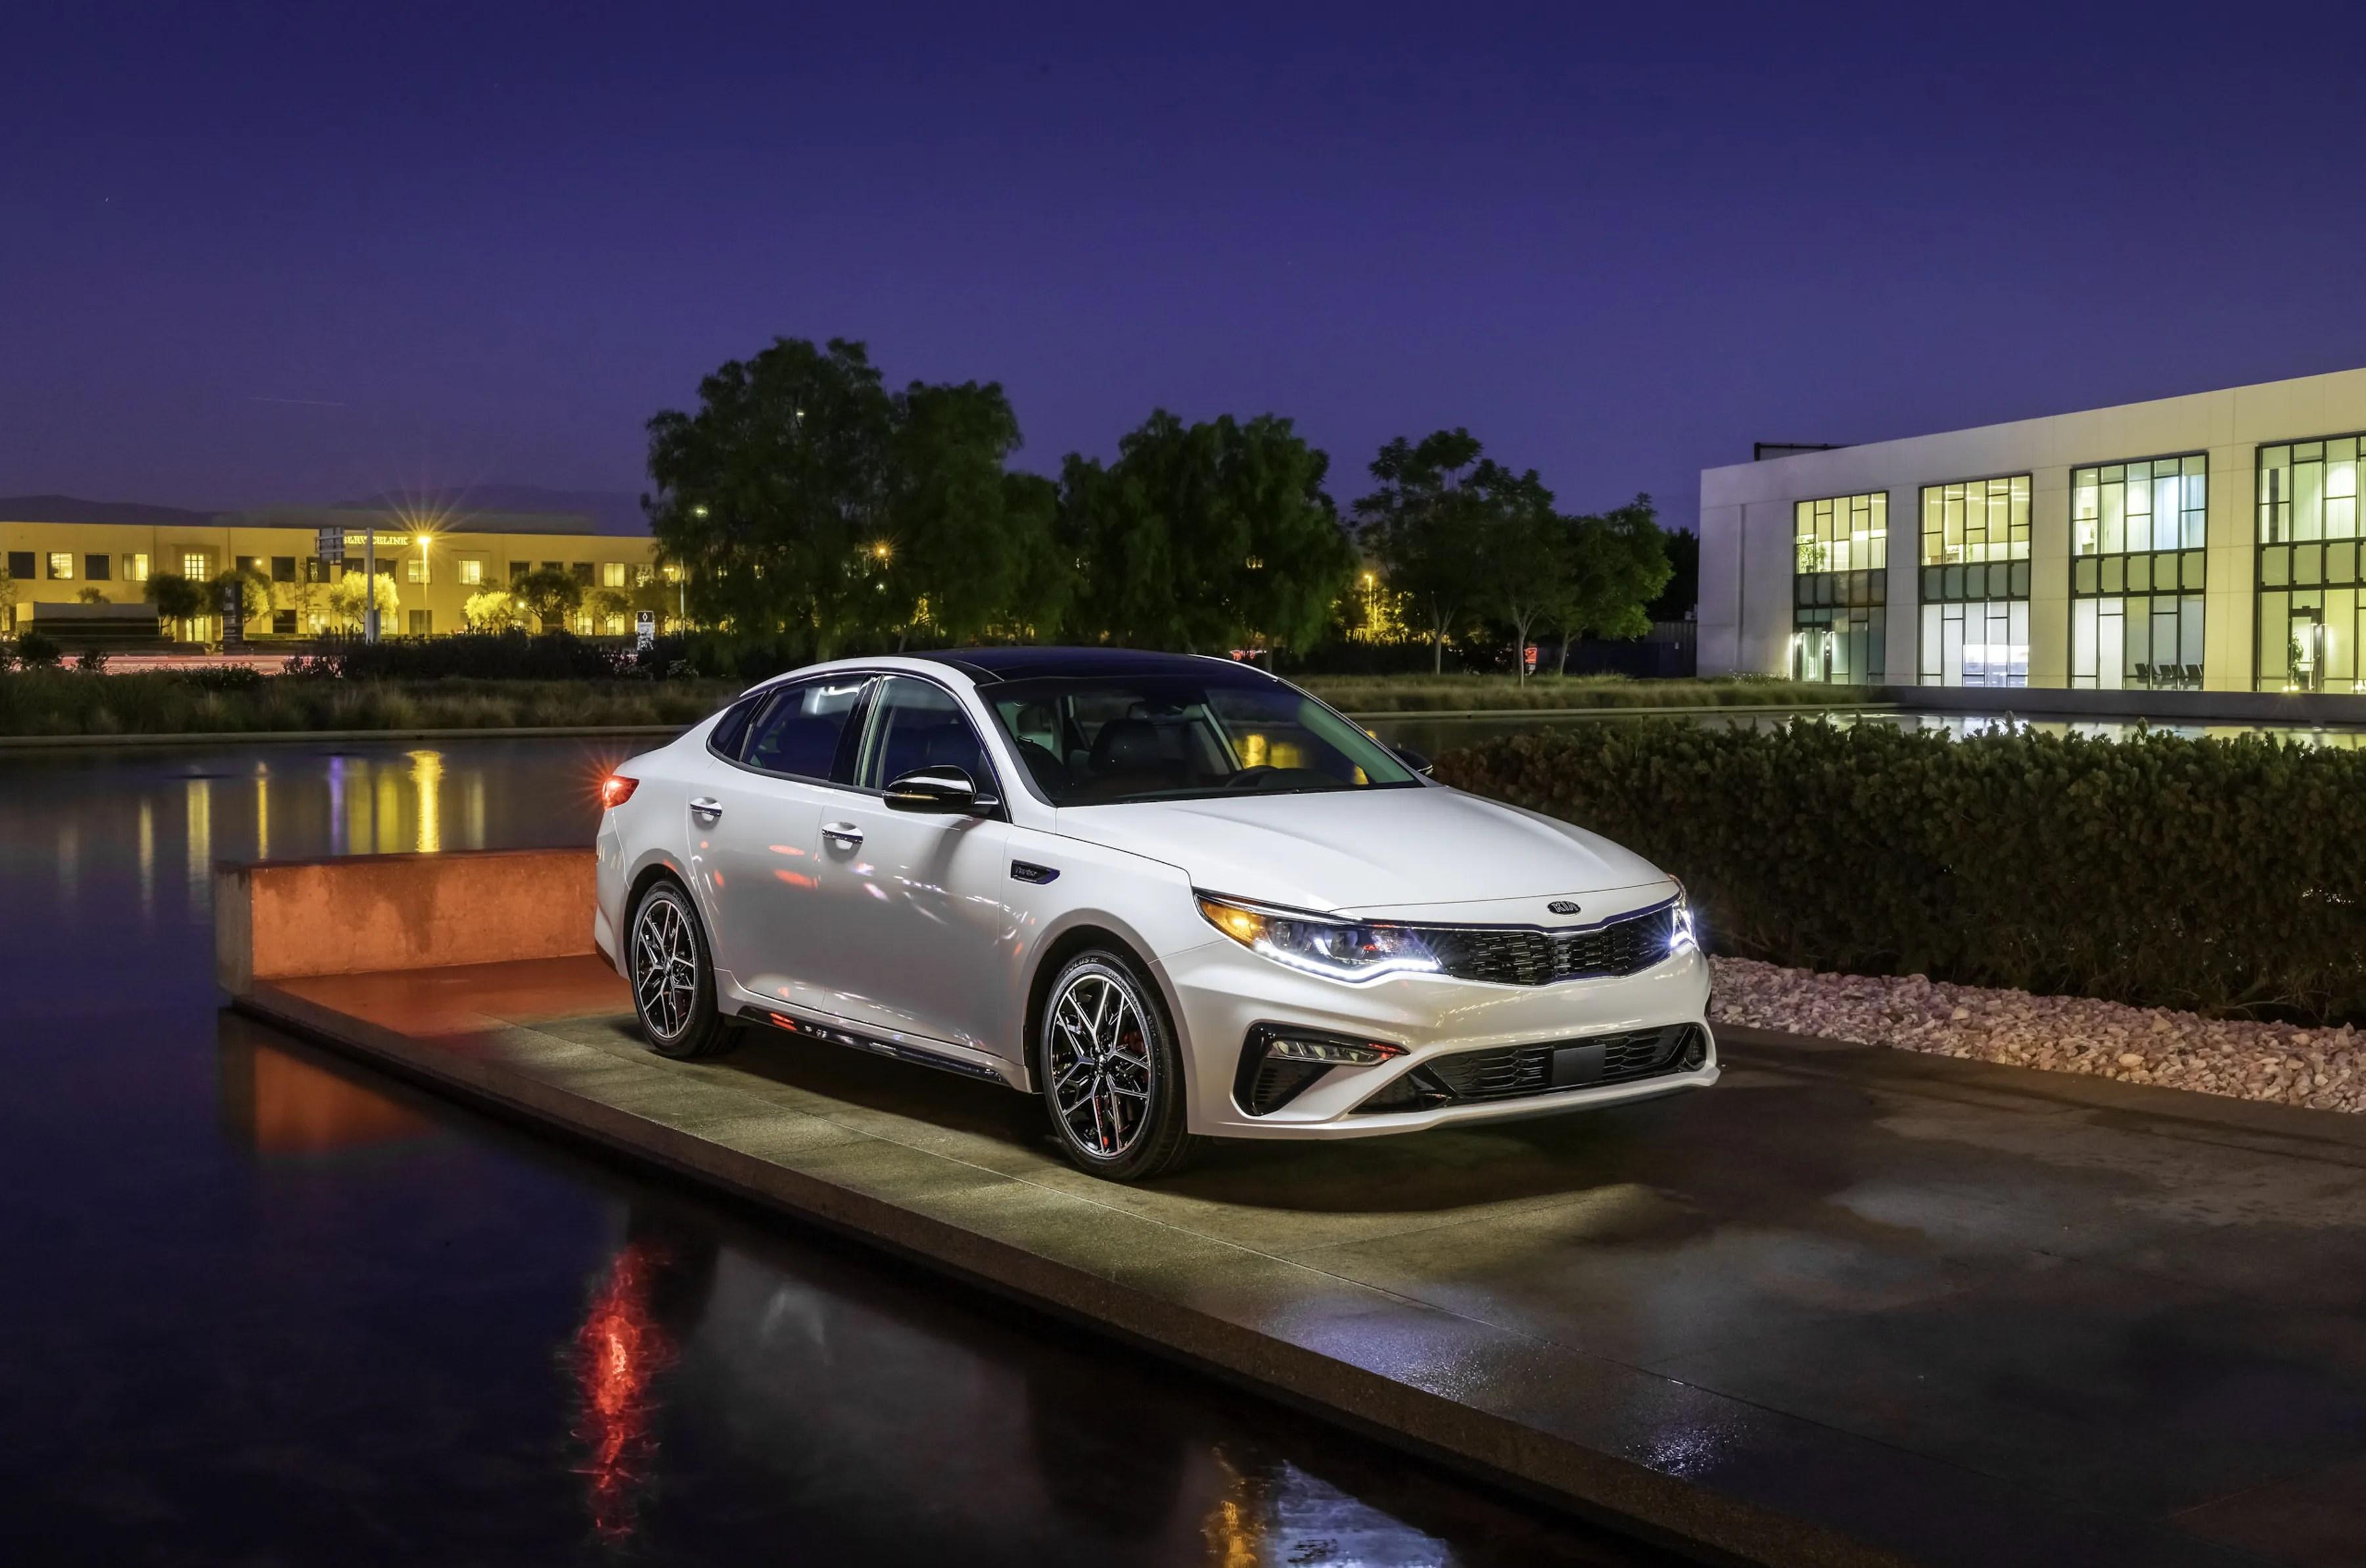 2019 Iihs Top Safety Pick Subaru Hyundai Kia Top List